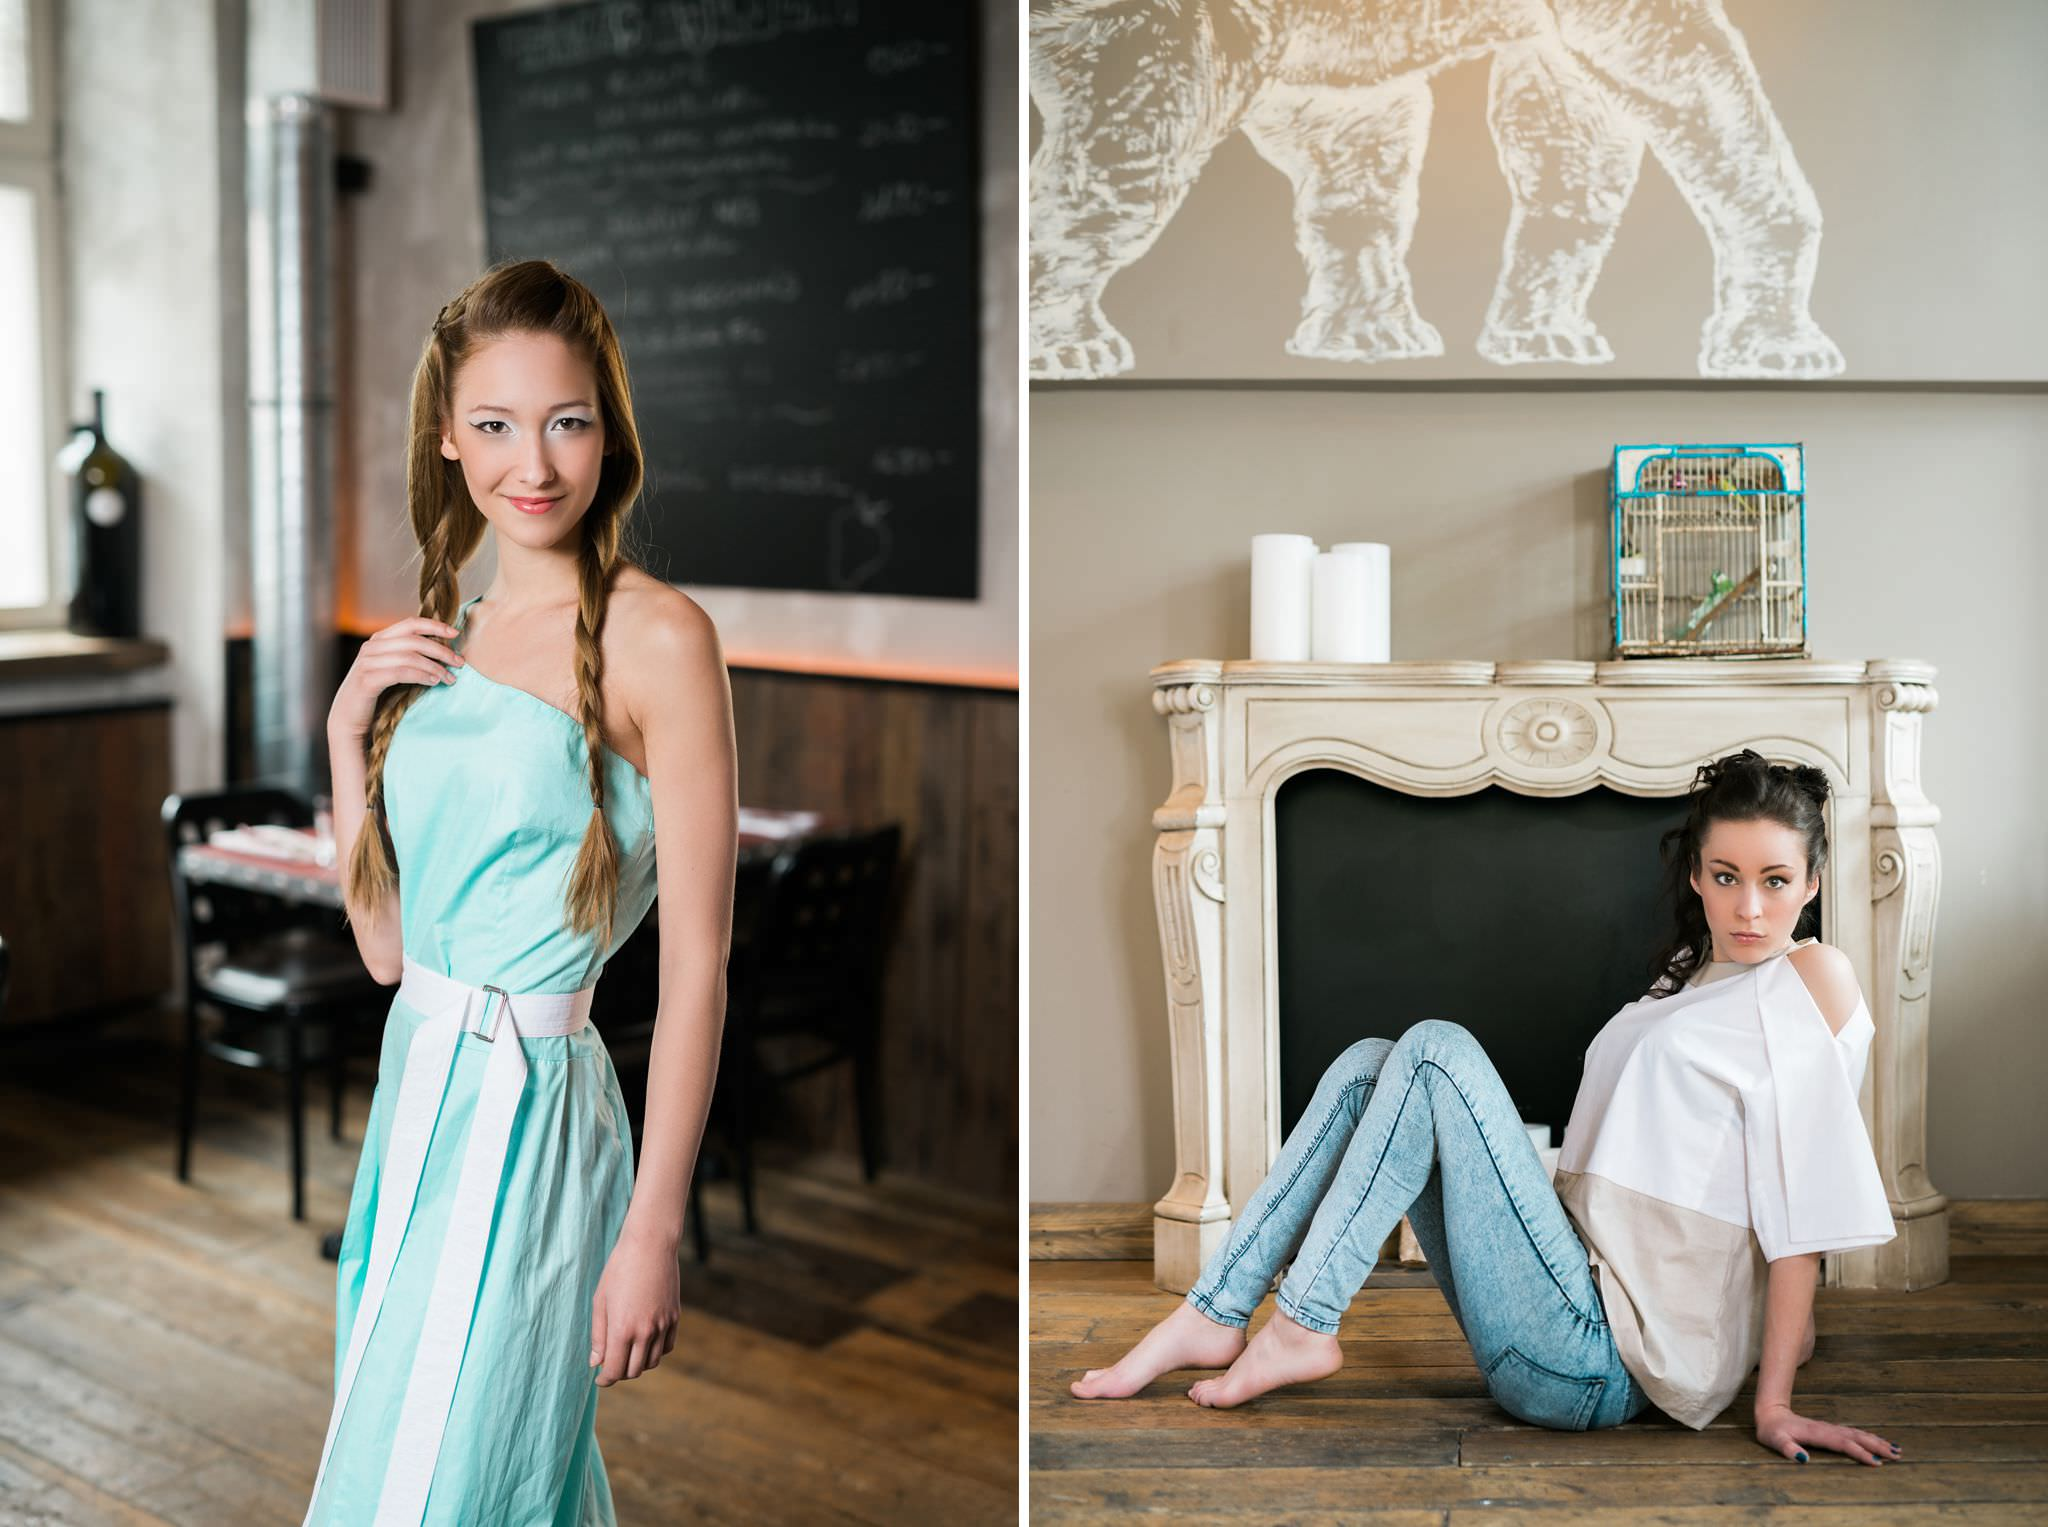 54-Rokolya_Fashion_Editorial_Lookbook_Baltazar_Budapest